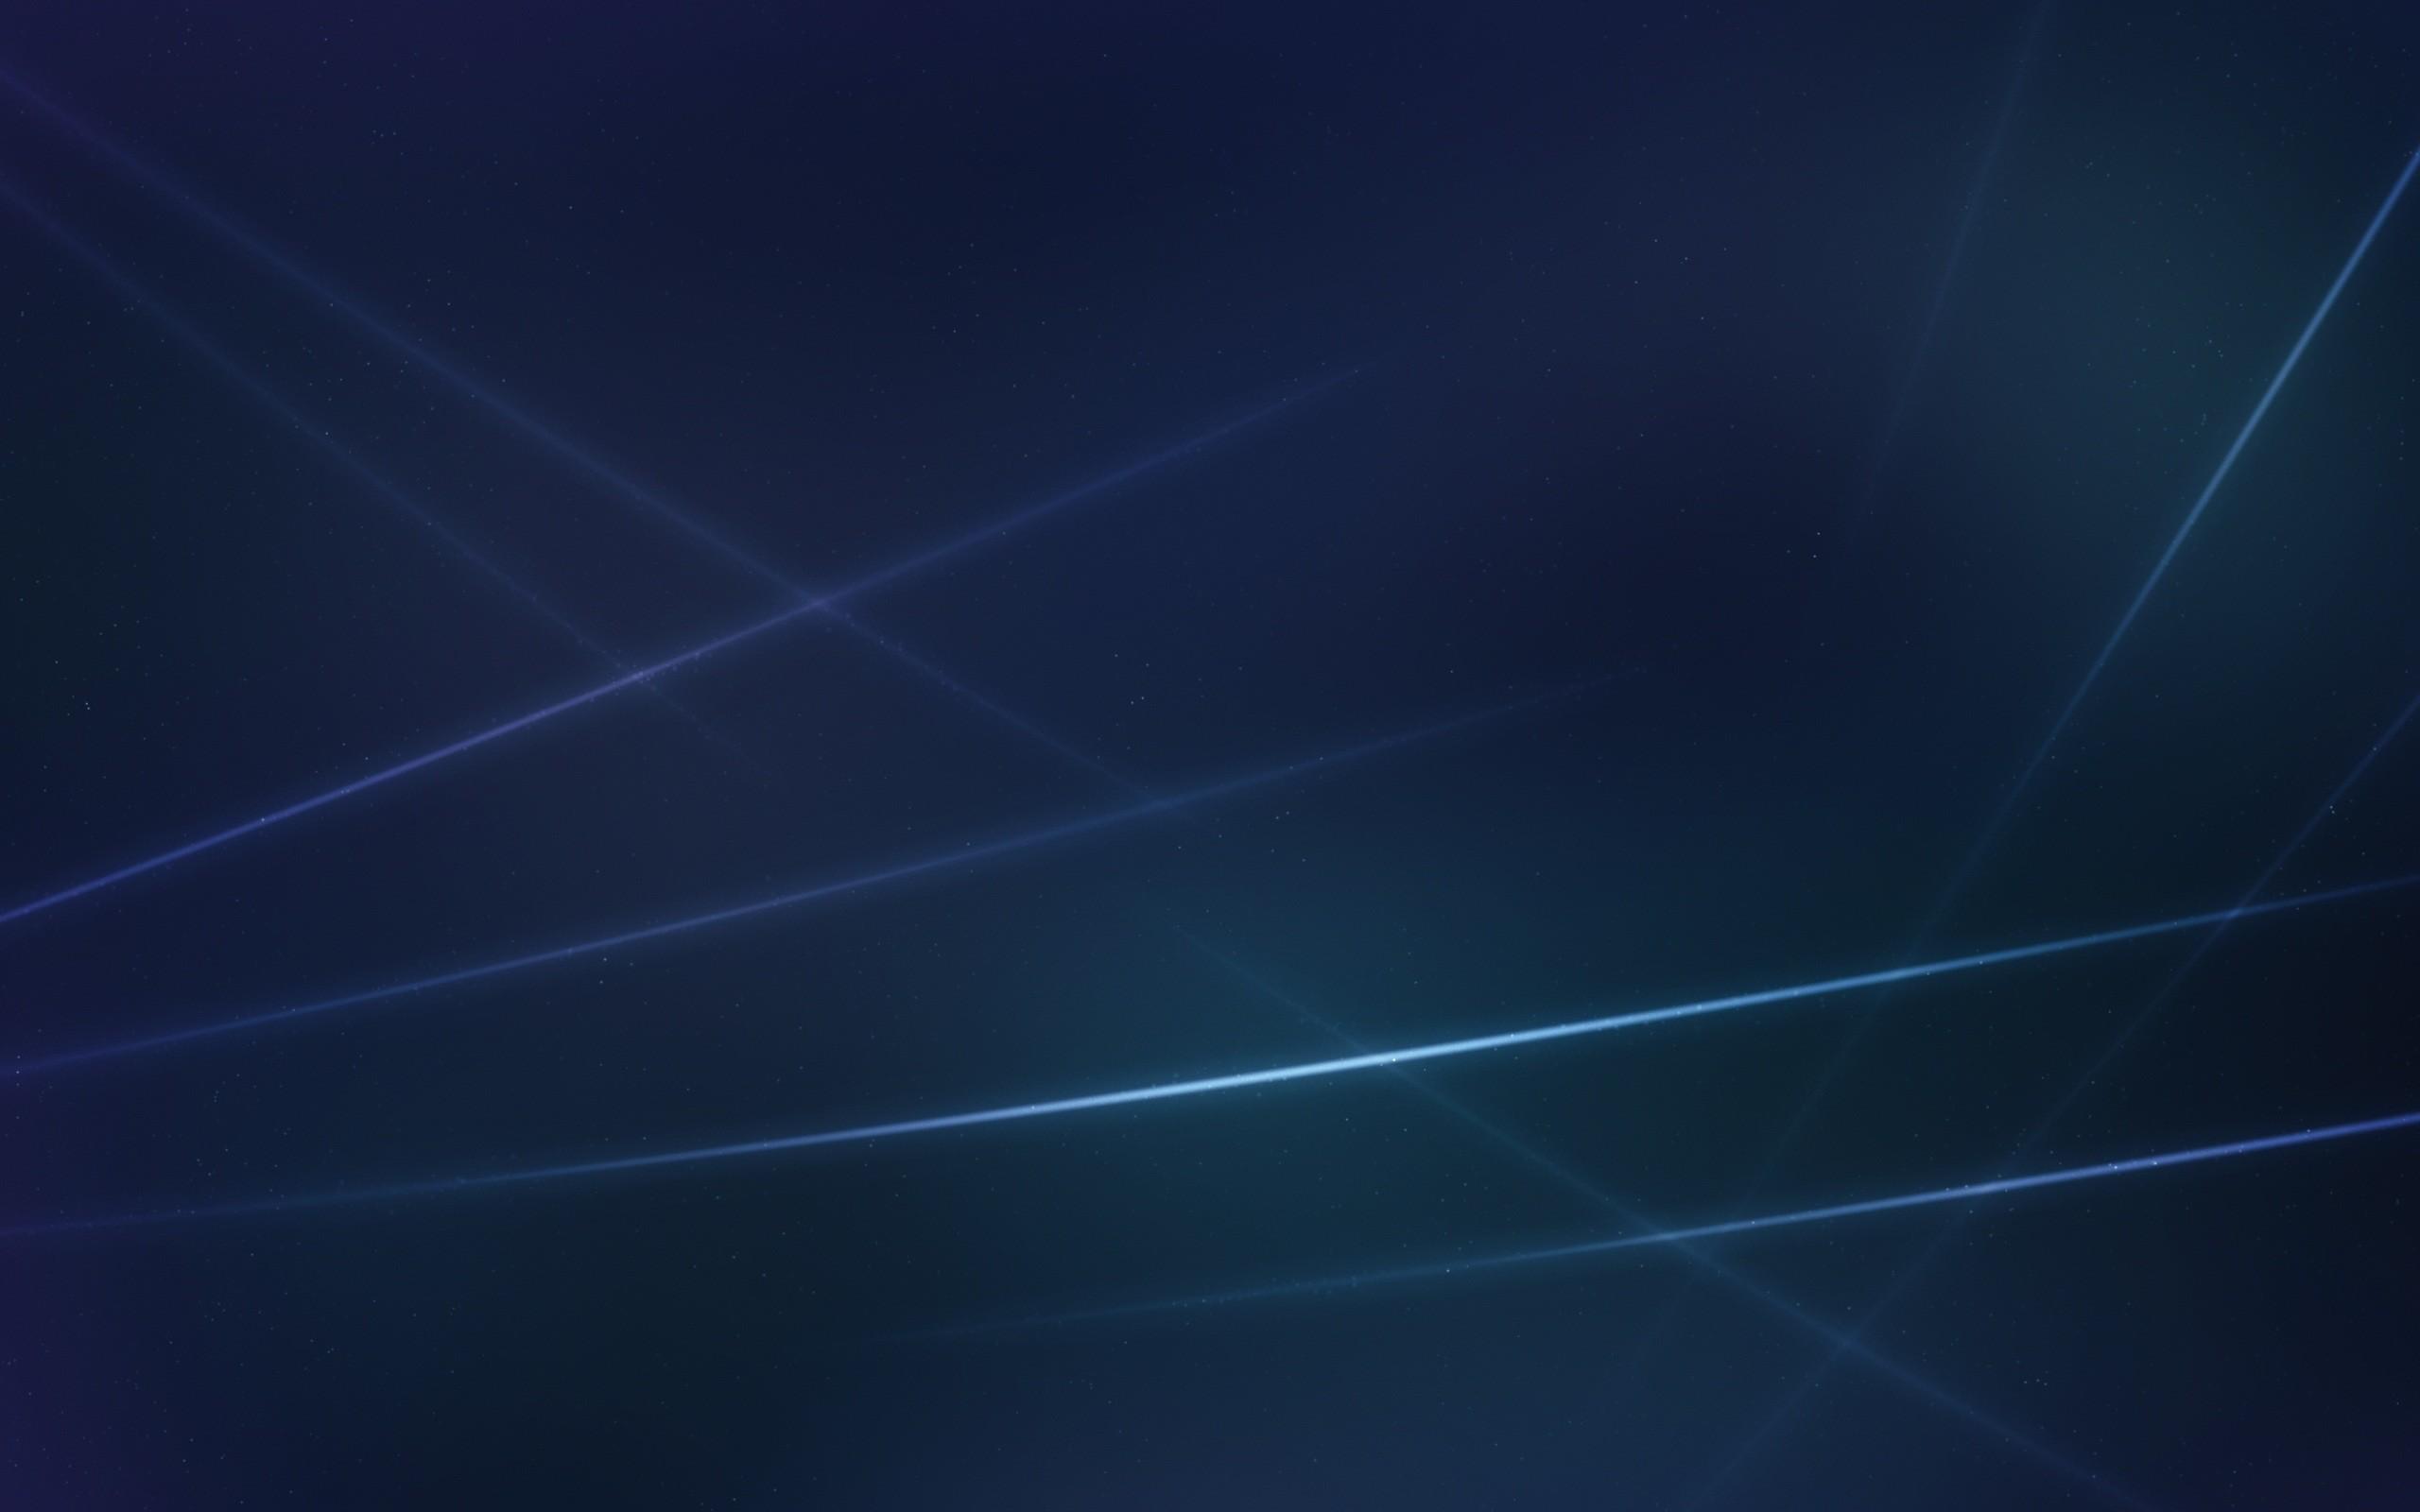 Light Rays, Dark Blue Background